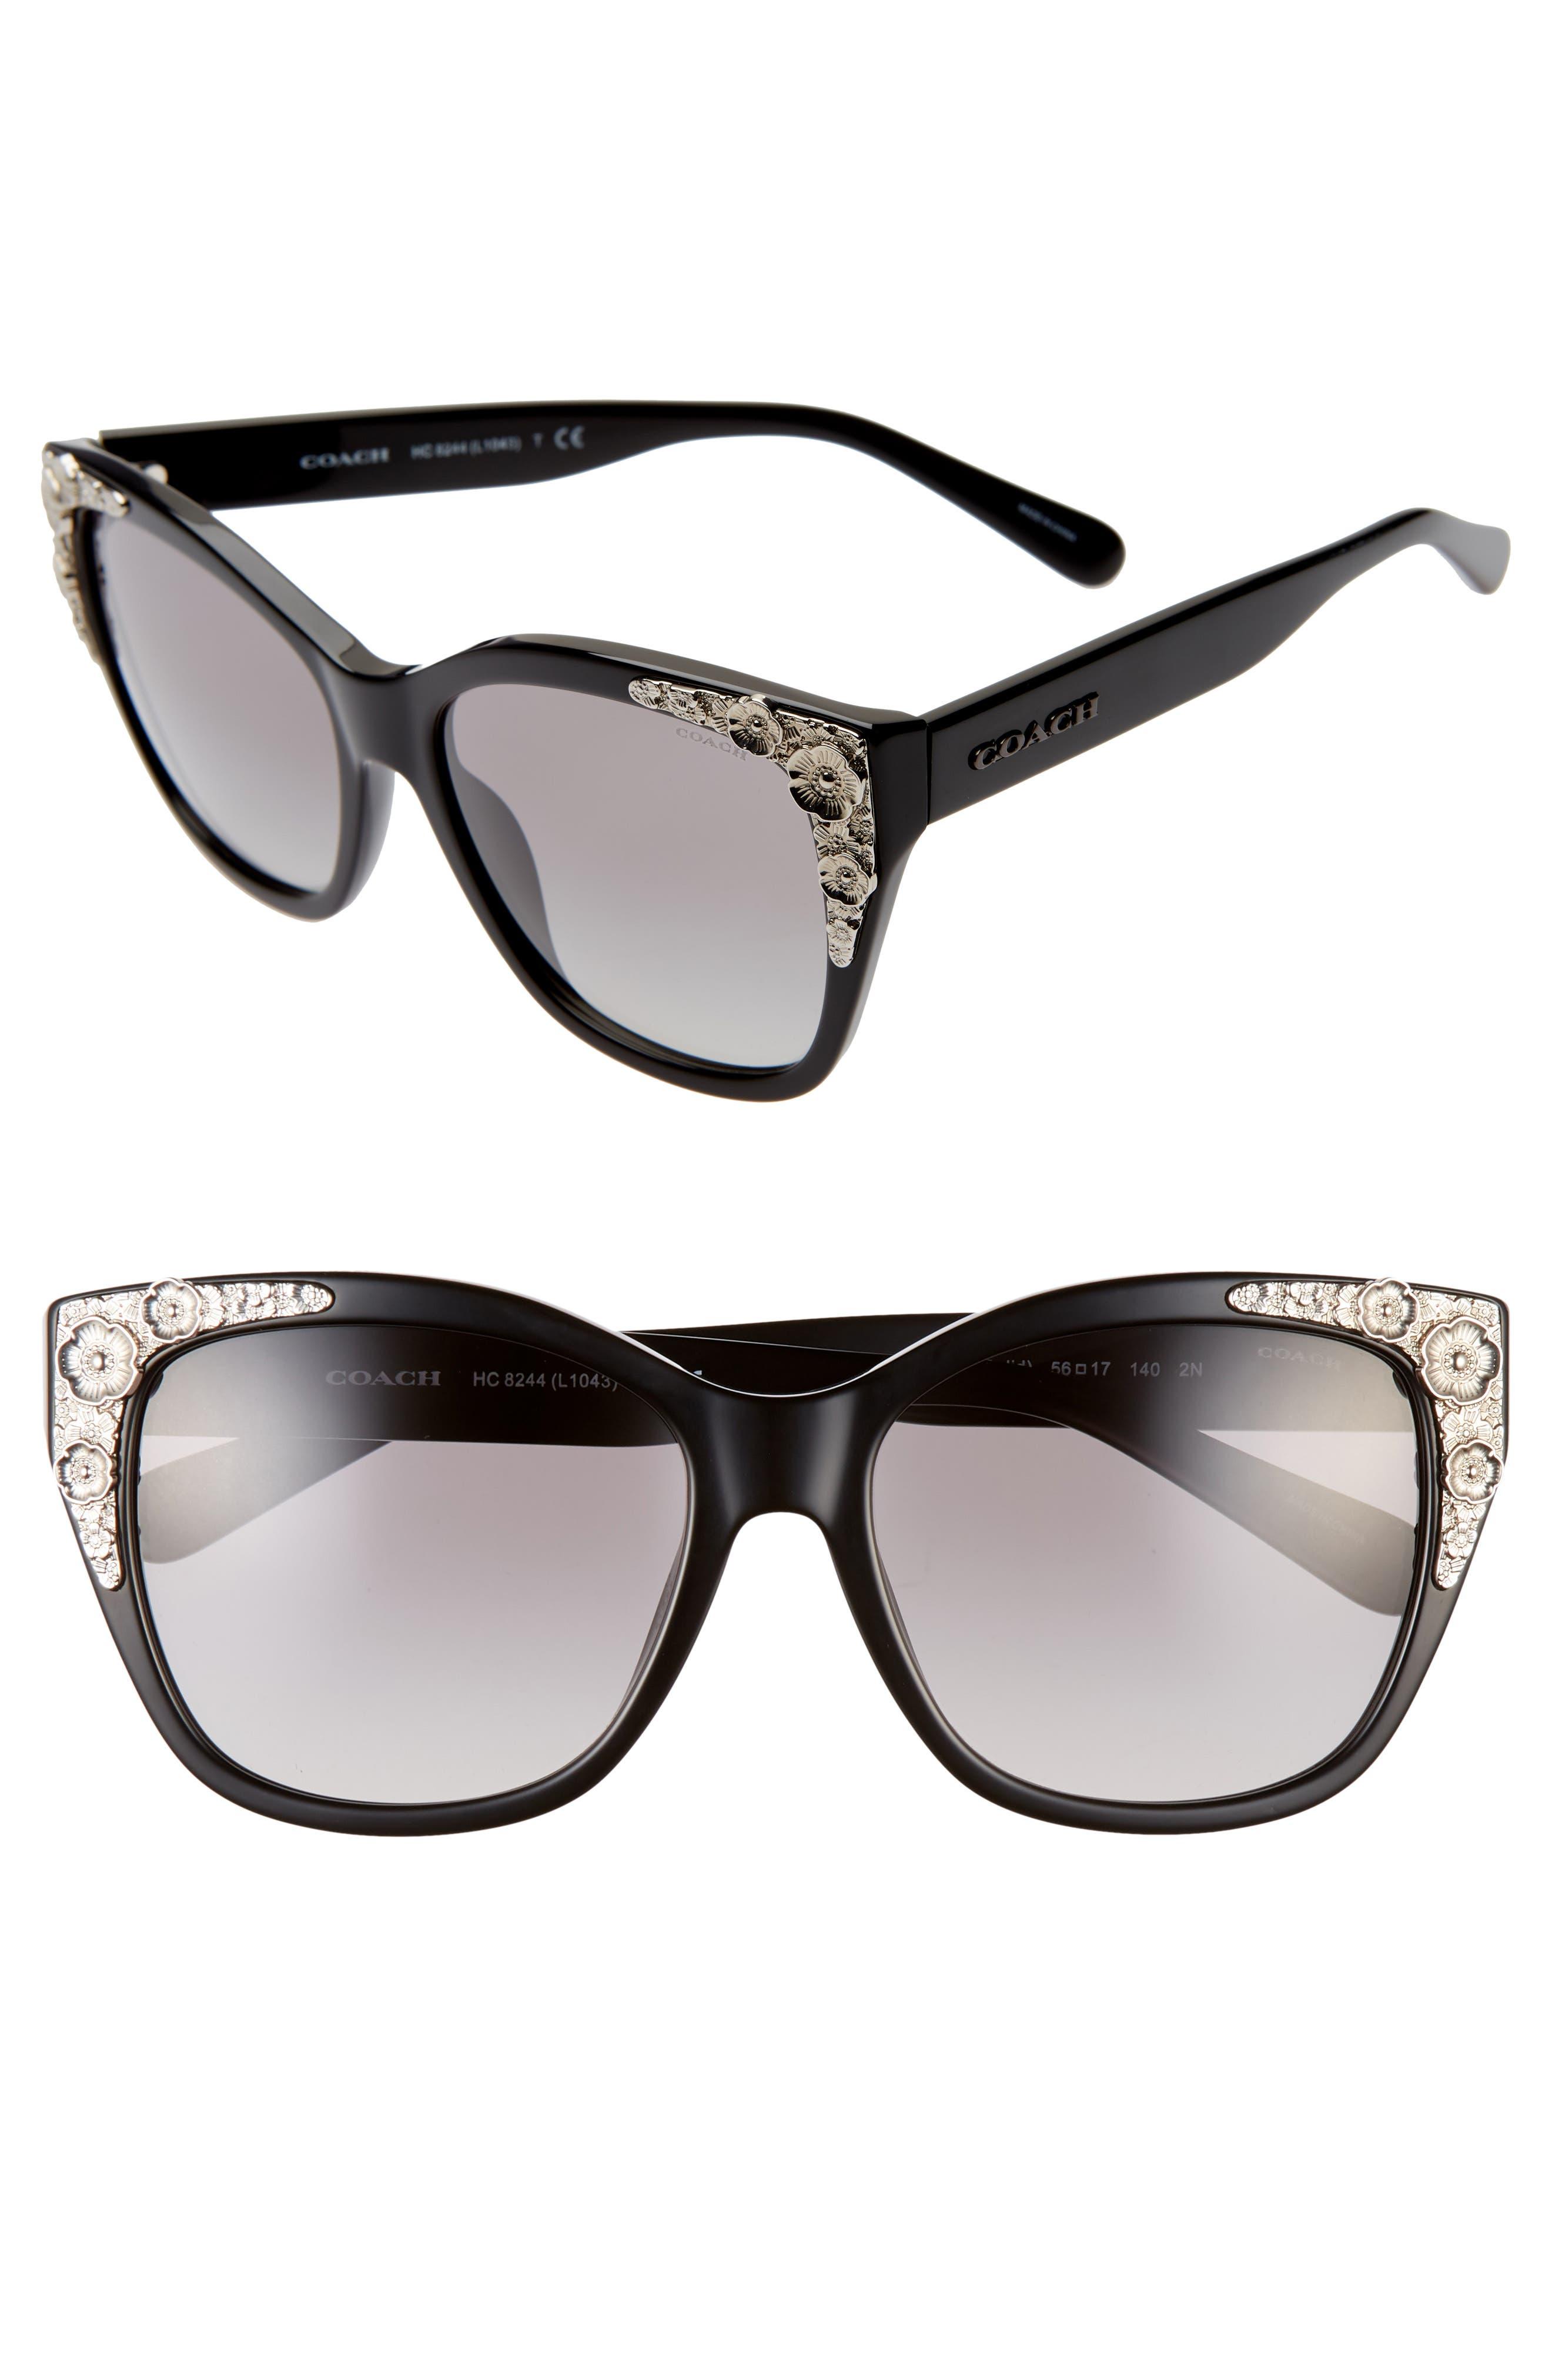 11c972e611 Women s COACH Cat-Eye Sunglasses